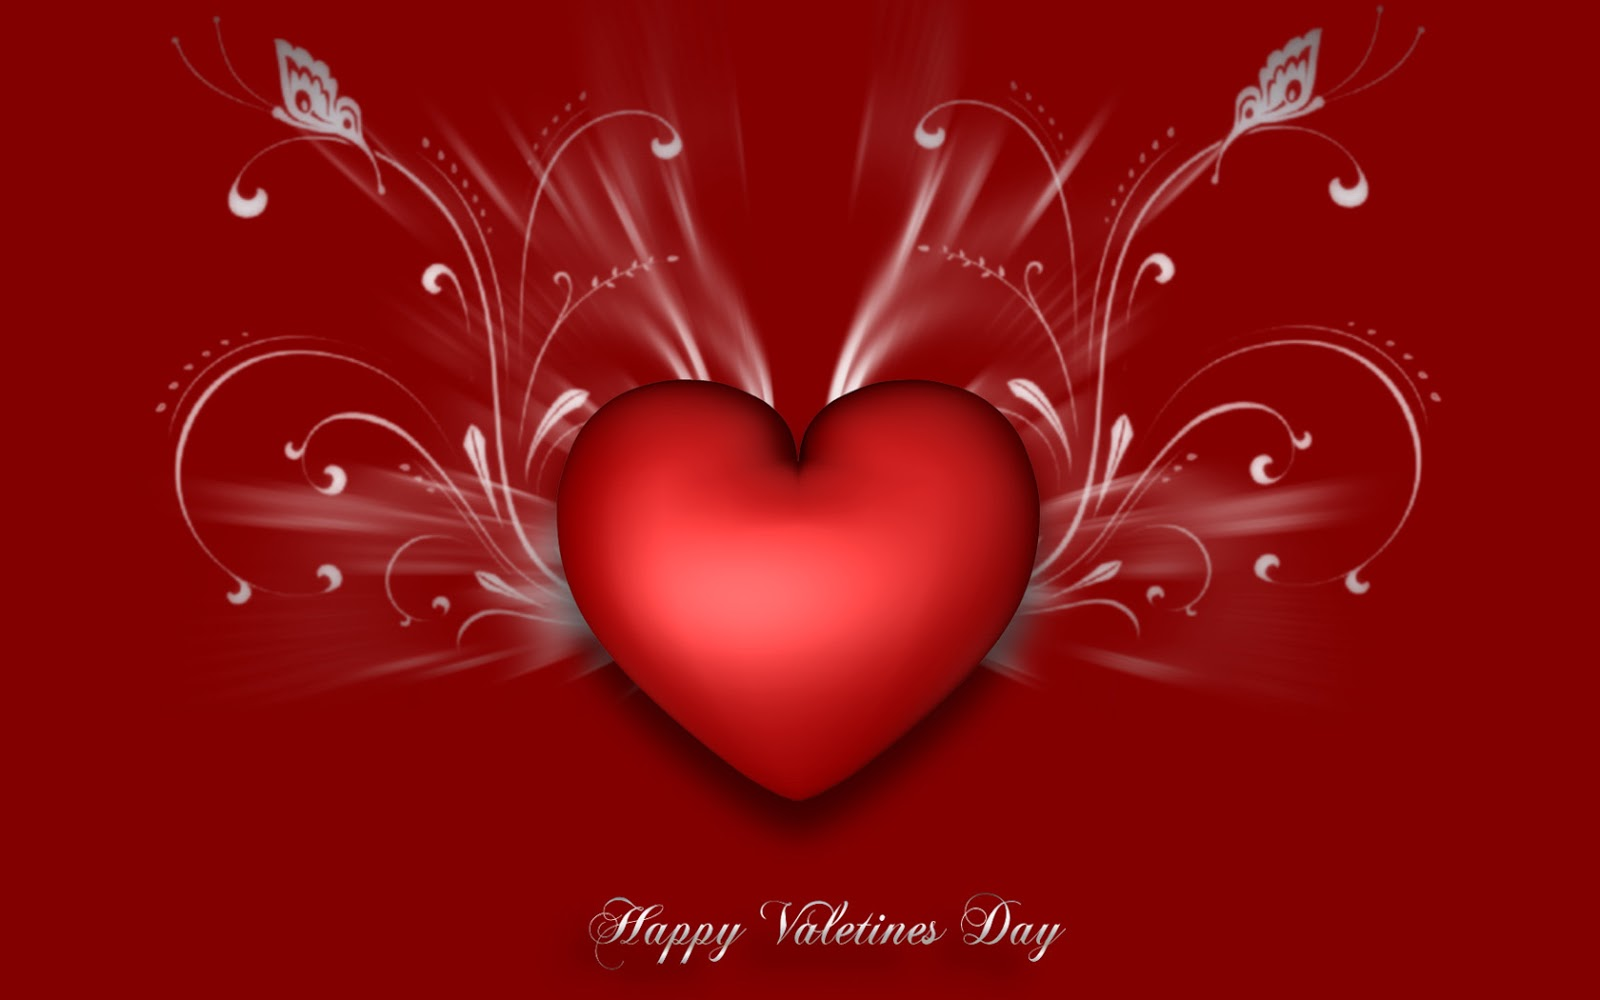 http://3.bp.blogspot.com/-g6HZJdQ1H3g/UPwWV-NE8II/AAAAAAAABCw/6H-8wf8x2Tg/s1600/valentine%27s+day+wallpaper-nacozinhacomamalves.blogspot.com-love-valentines-day-11.jpg